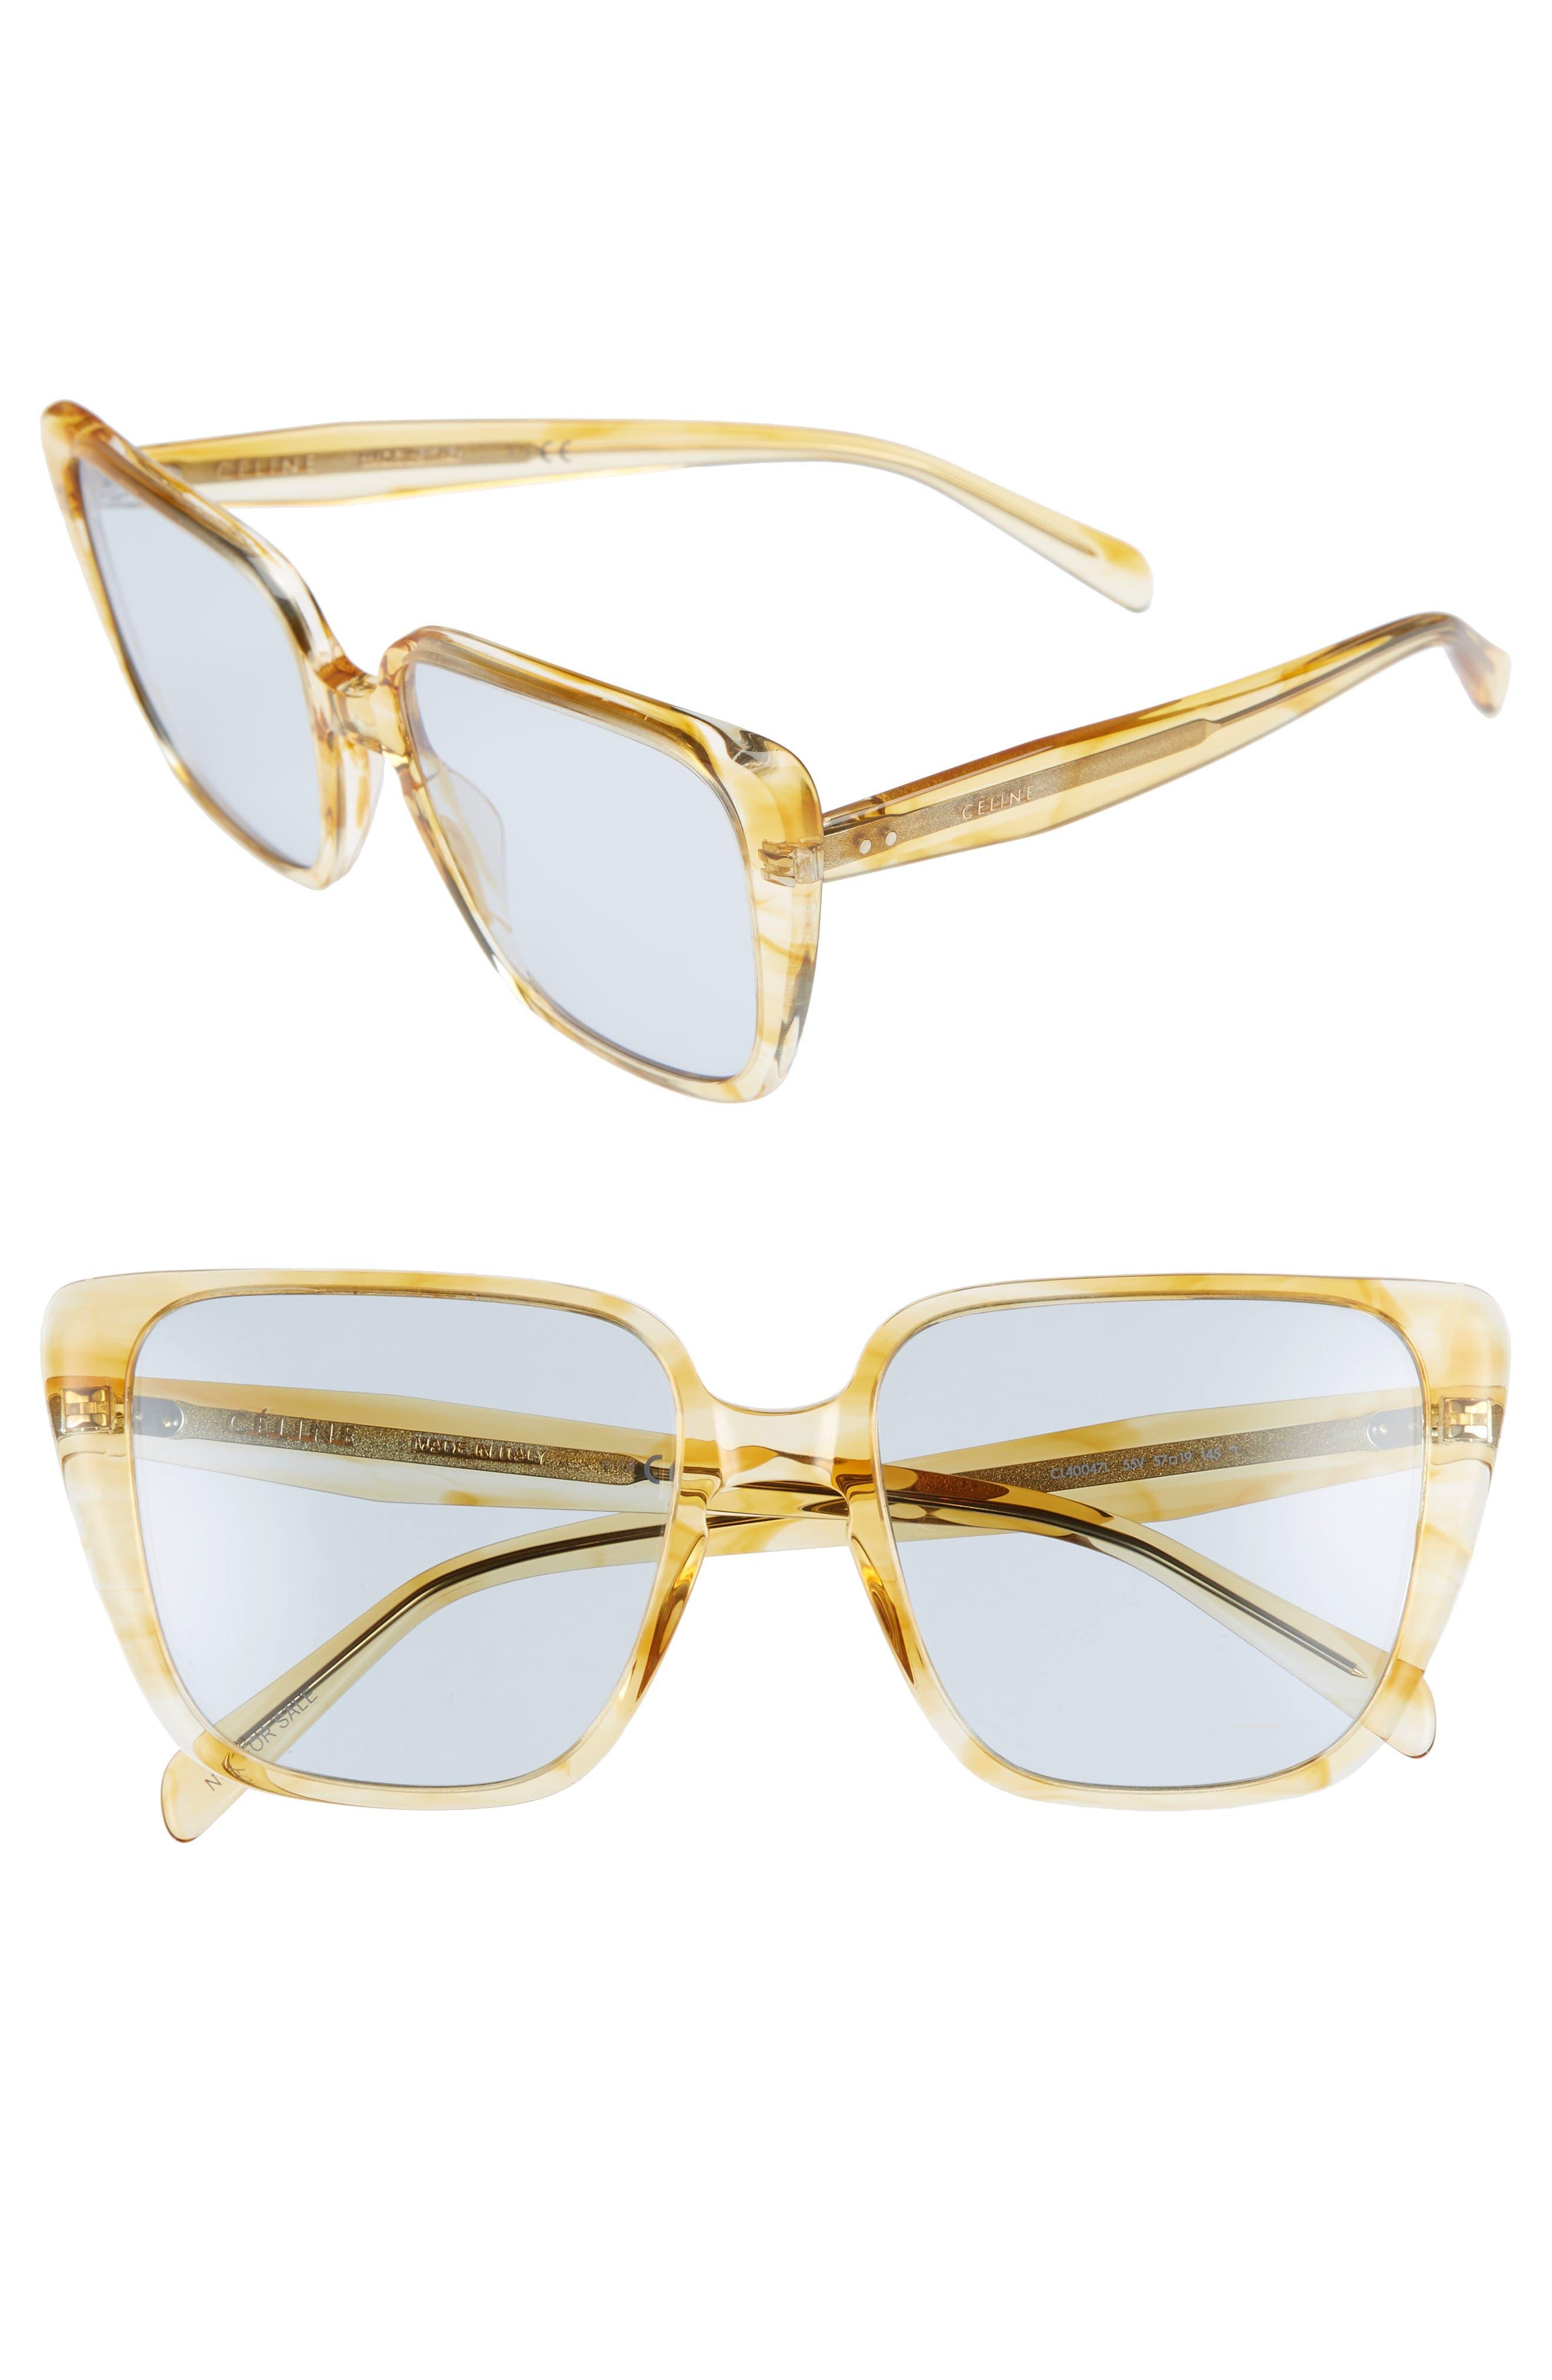 57Mm Modified Square Cat Eye Sunglasses - Striped Yellow Havana